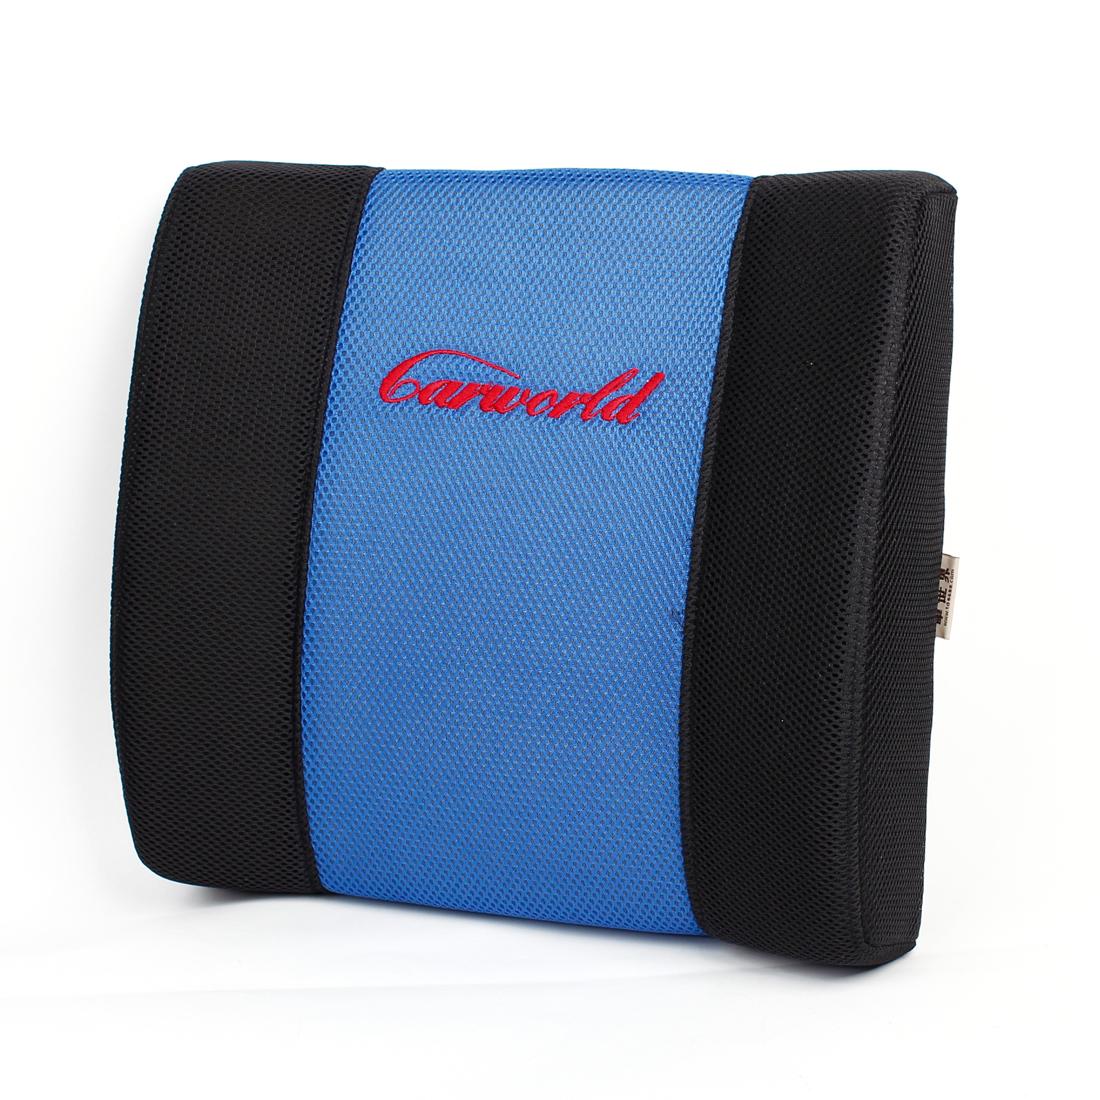 Vehicle Car Seat Sofa Lumbar Waist Back Relaxing Pillow Cushion Blue Black